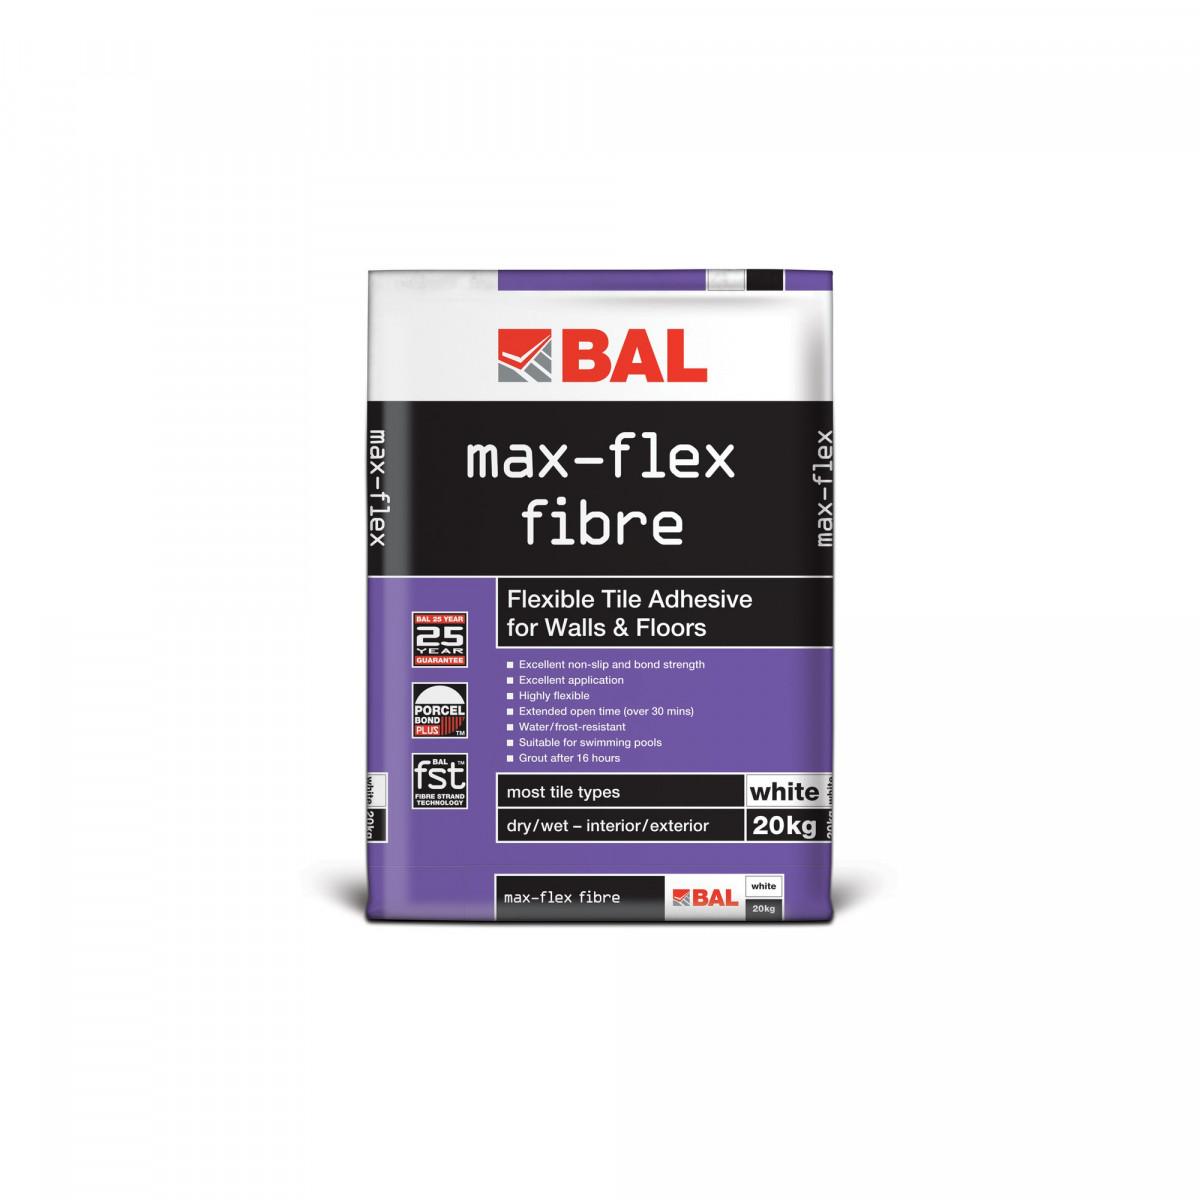 BAL Adhesive BAL Max-flex Fibre Adhesive Grey 20 Kg